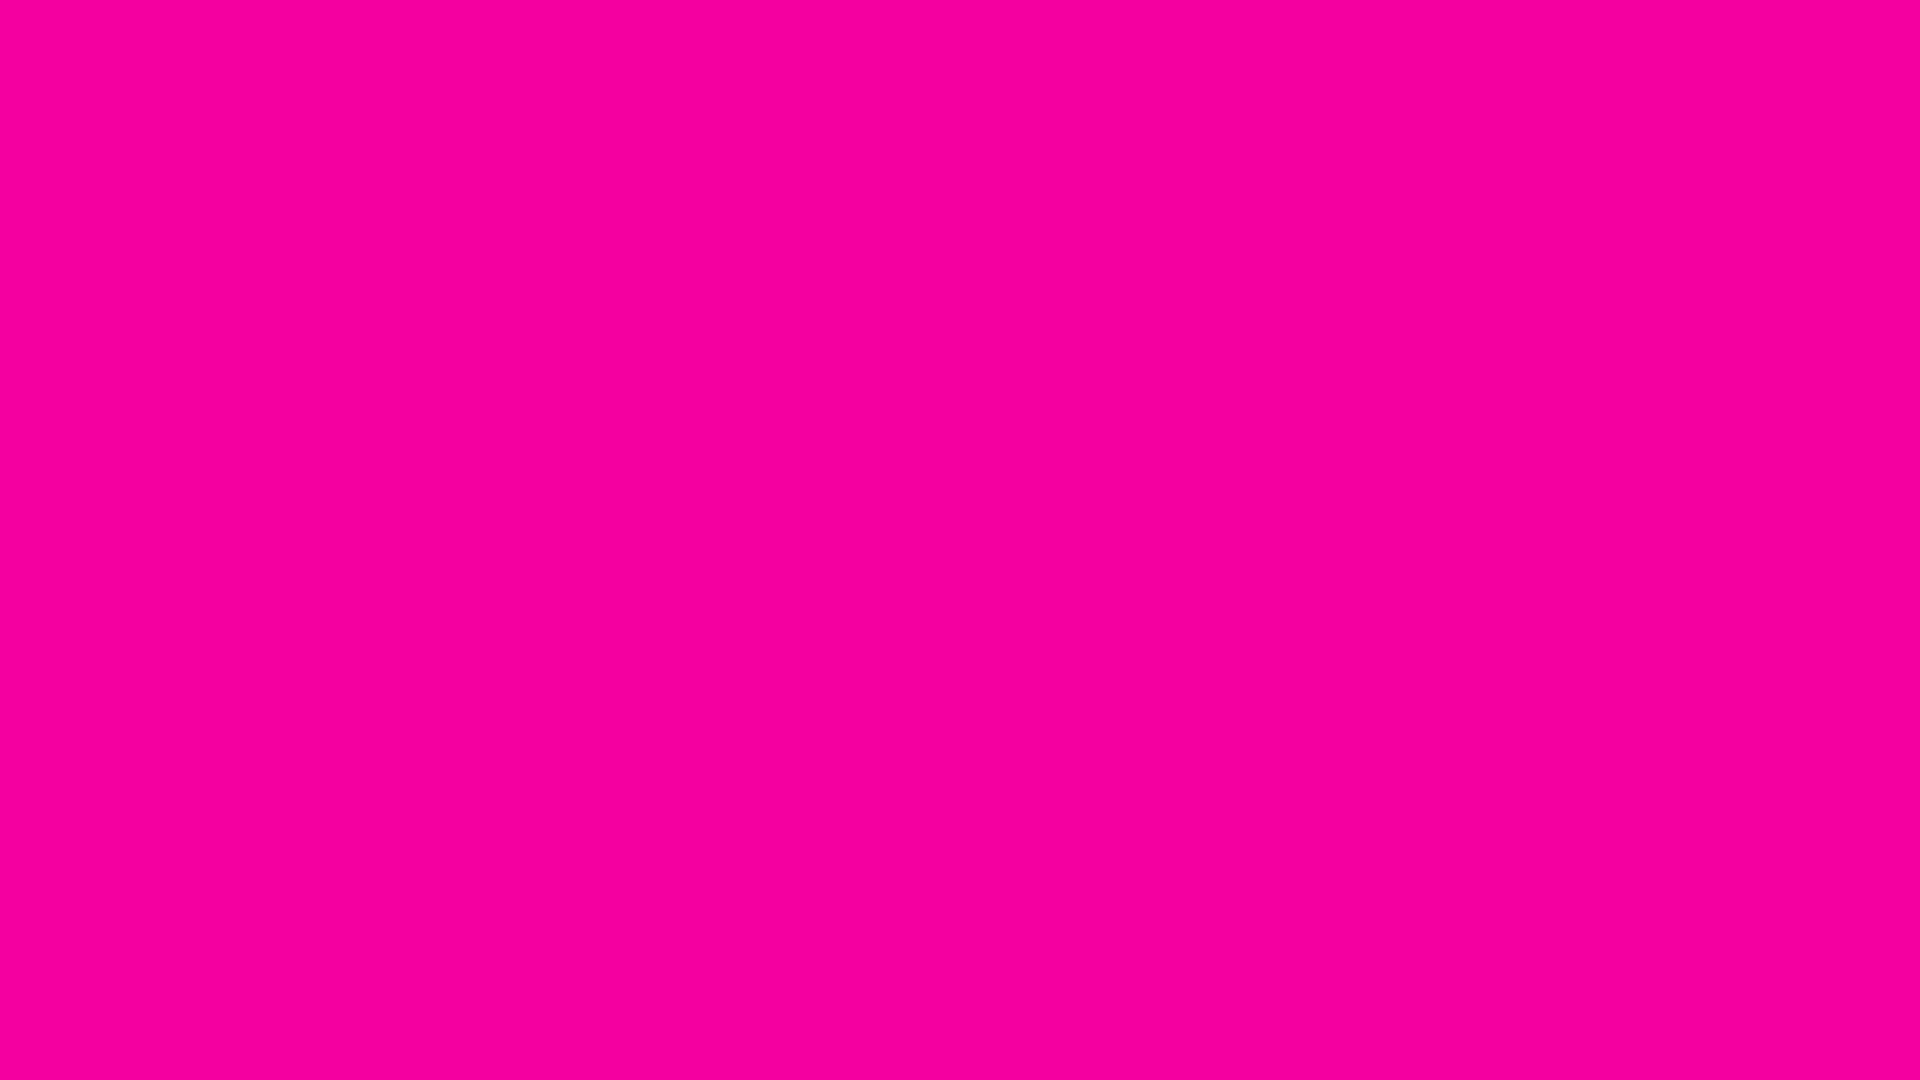 Best 46 Fuchsia Wallpaper on HipWallpaper Fuchsia Wallpaper 1920x1080